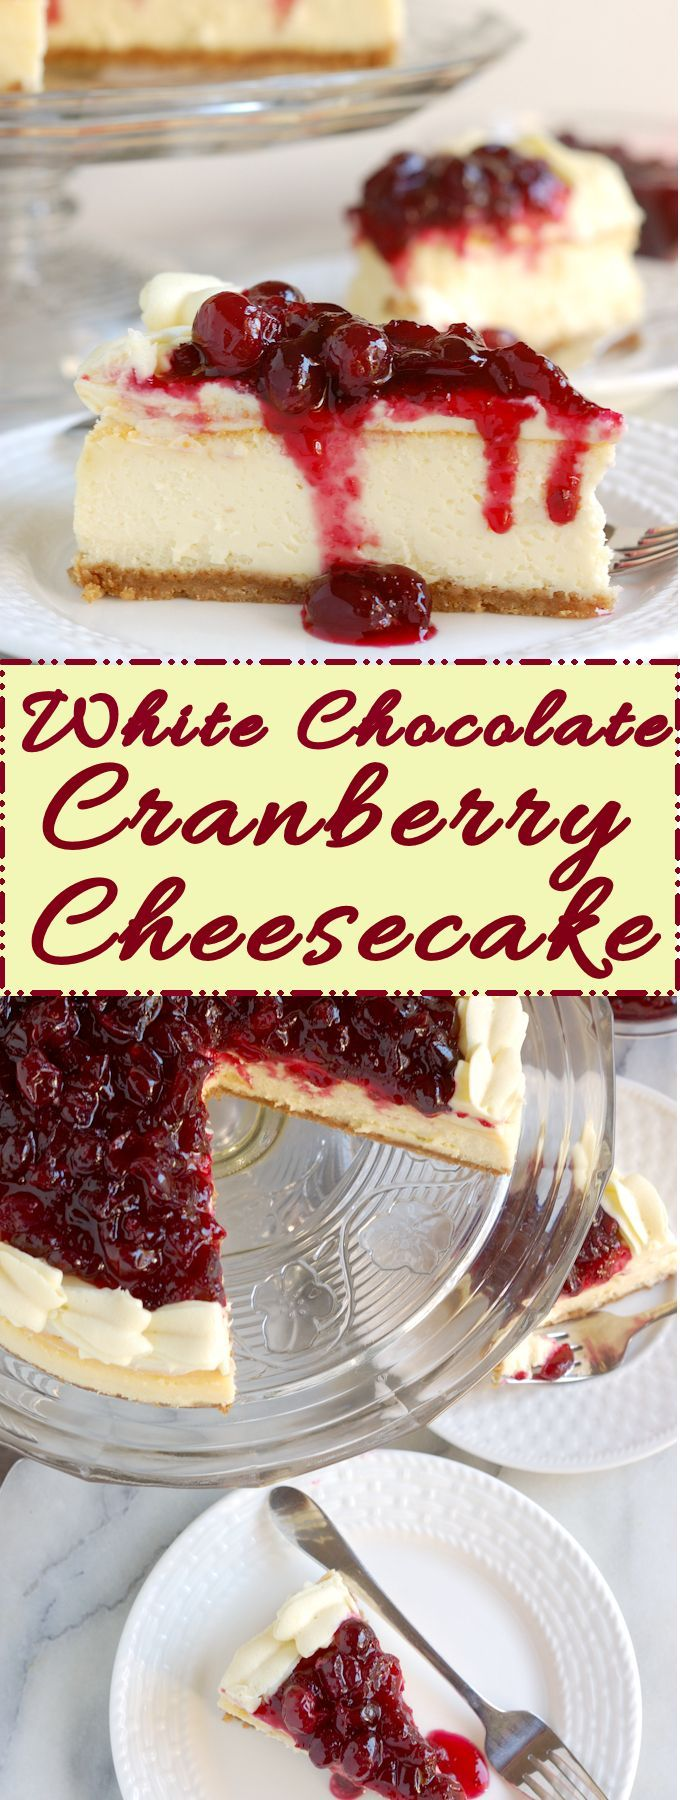 White Chocolate Cranberry Cheesecake Recipe Desserts Cranberry Recipes Chocolate Cranberry Cheesecake